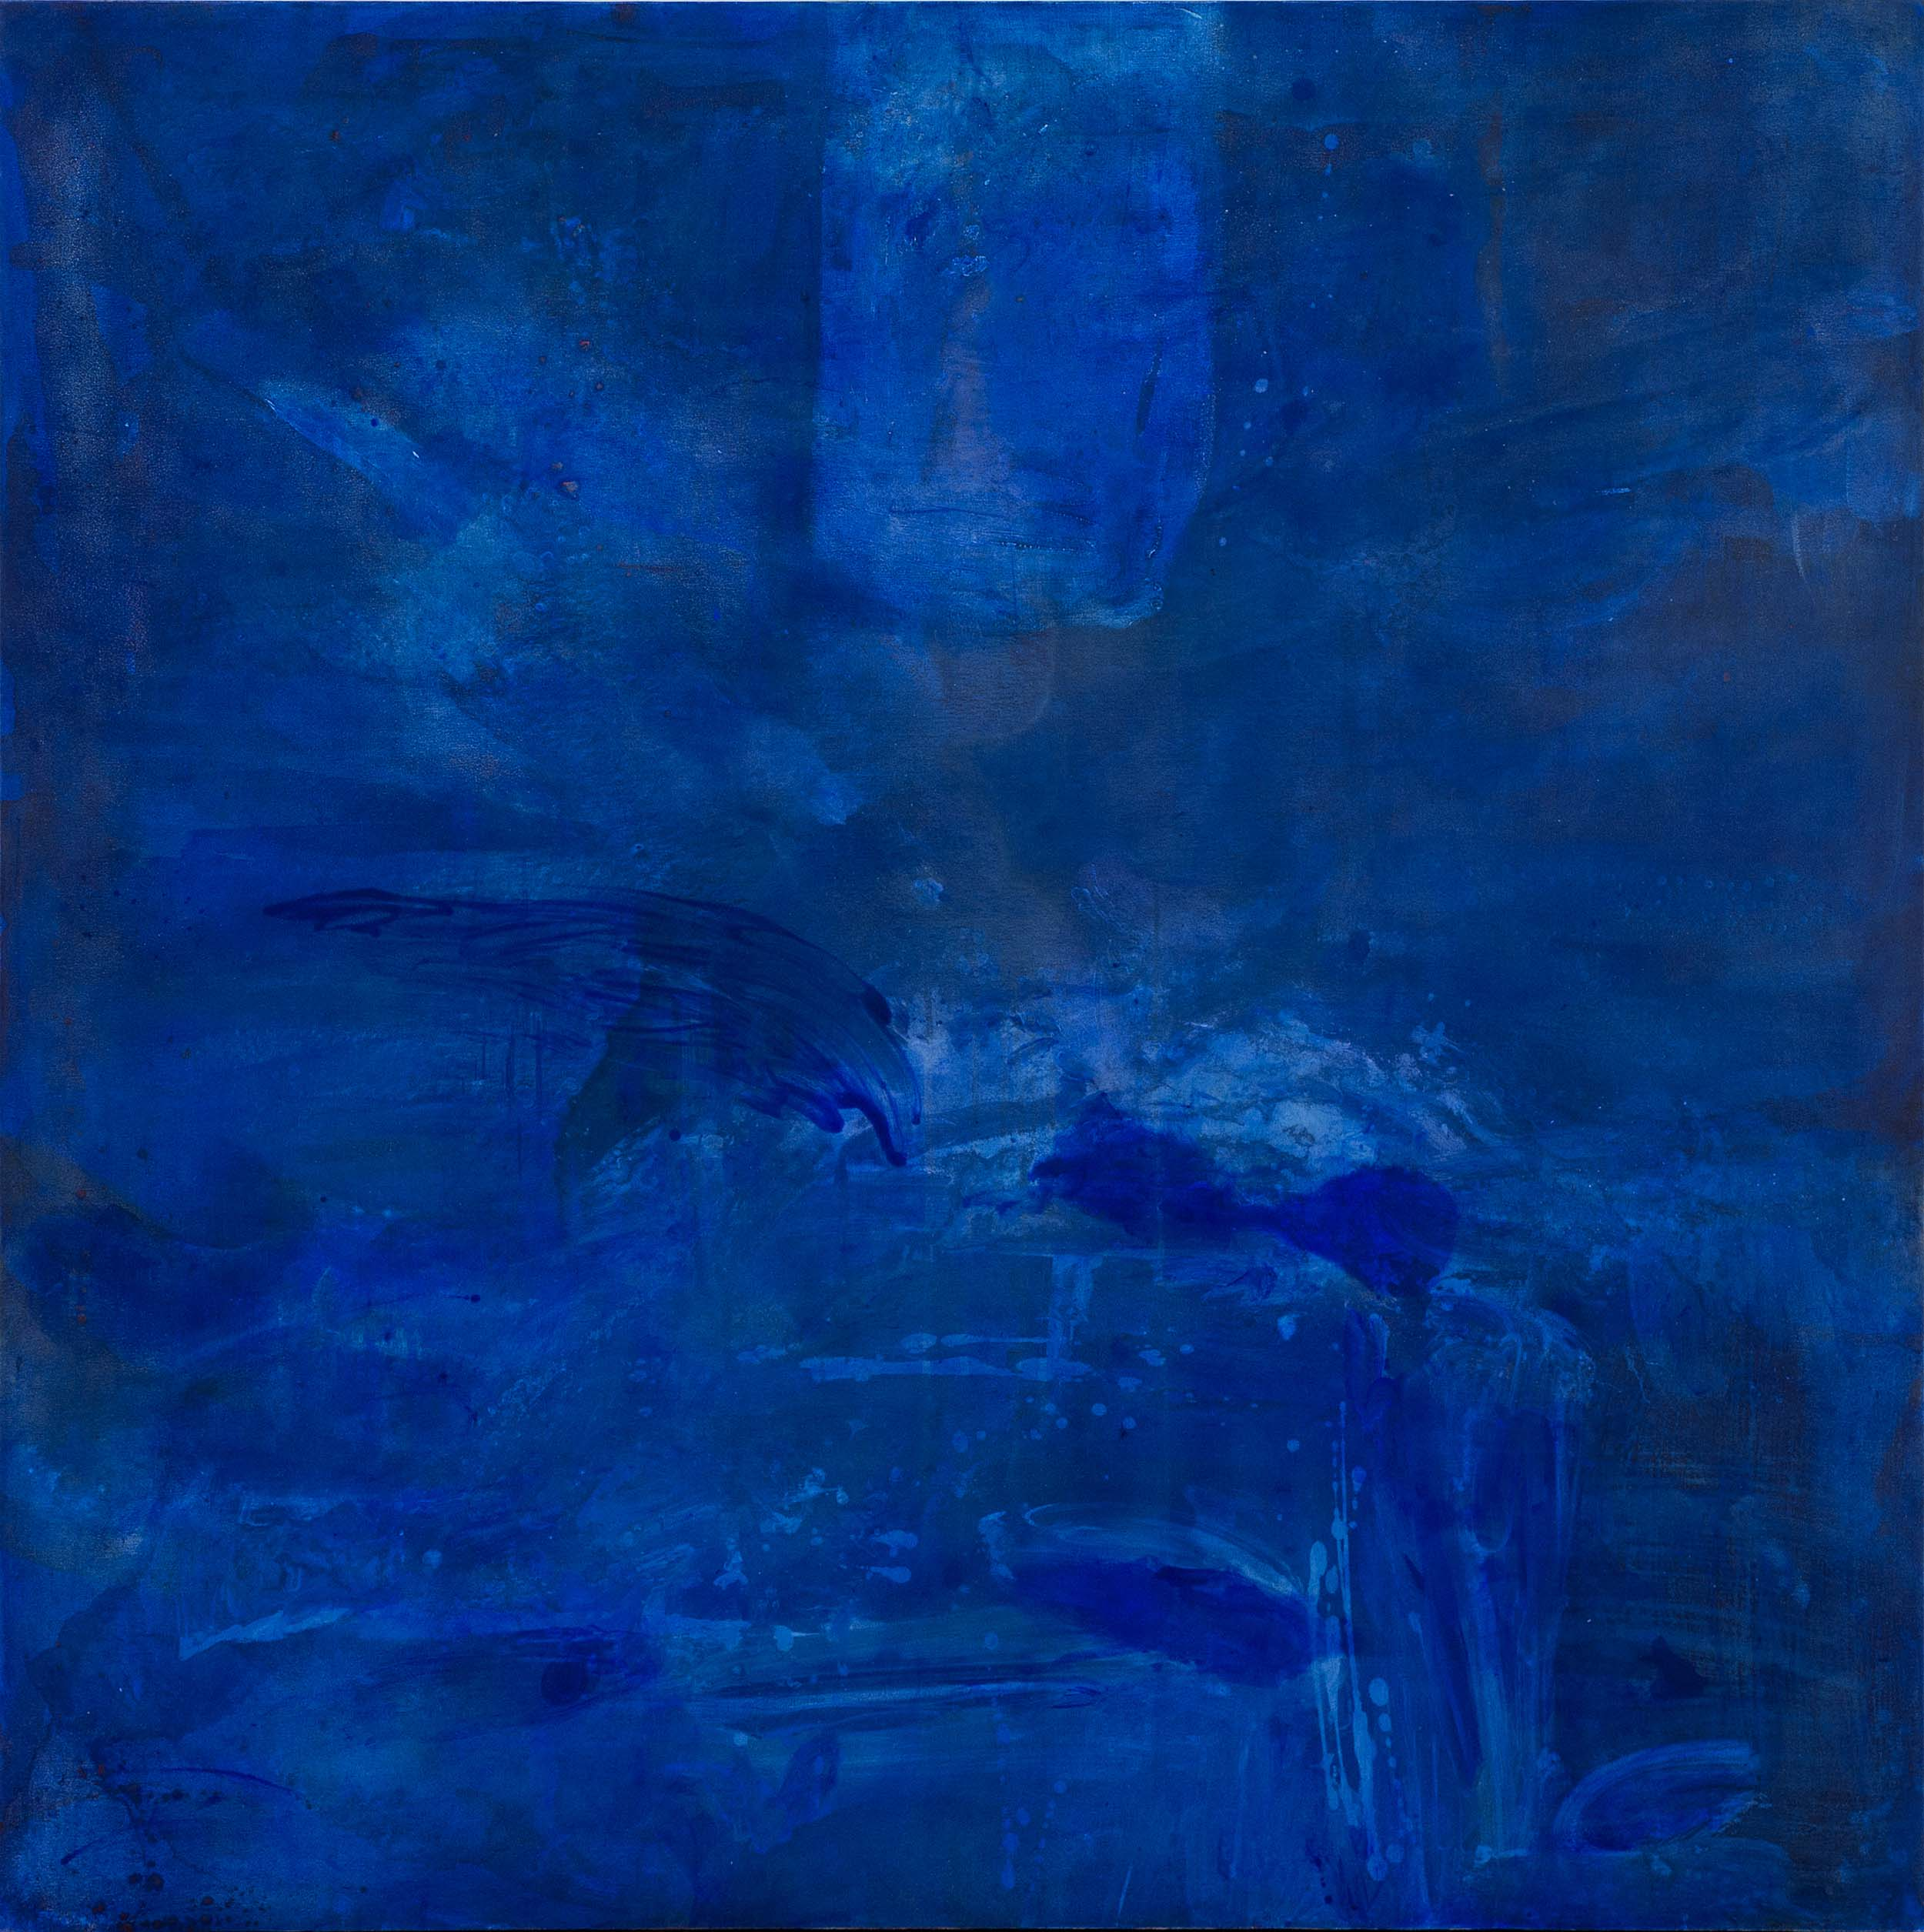 Azul Trapo (2014) - Ángela Wilson Searle